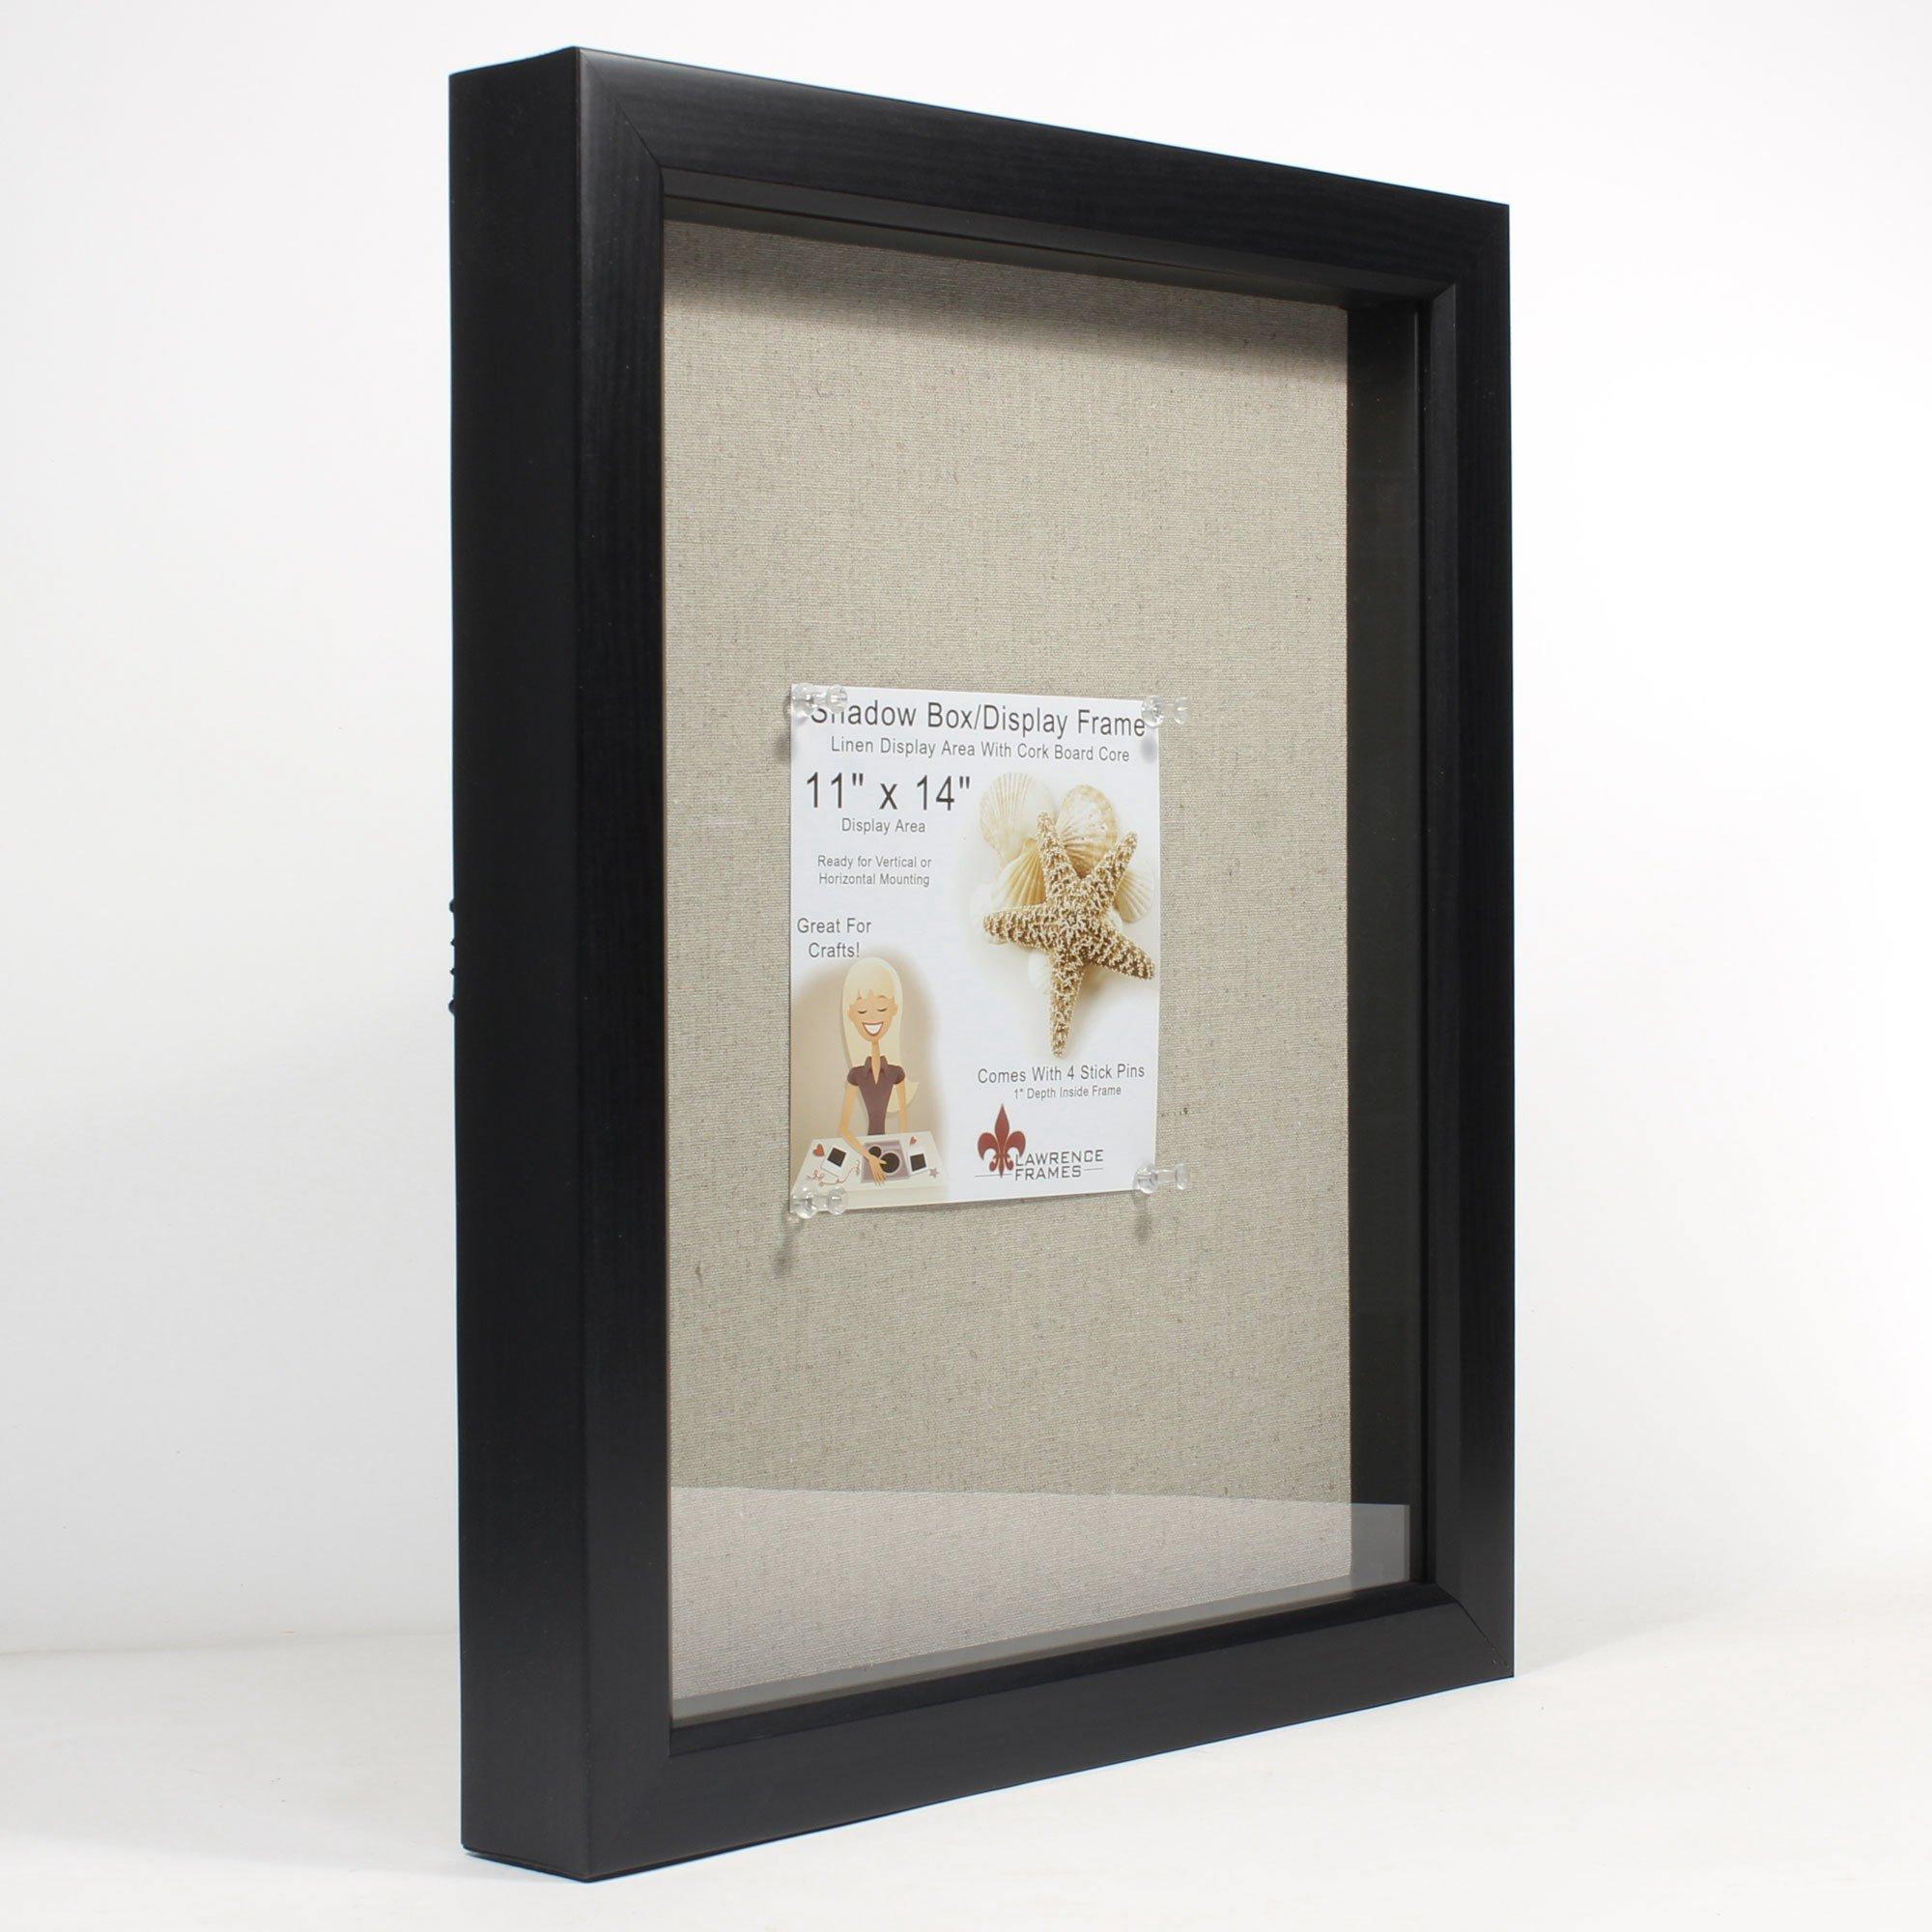 lawrence frames 11 by 14 inch black shadow box frame. Black Bedroom Furniture Sets. Home Design Ideas